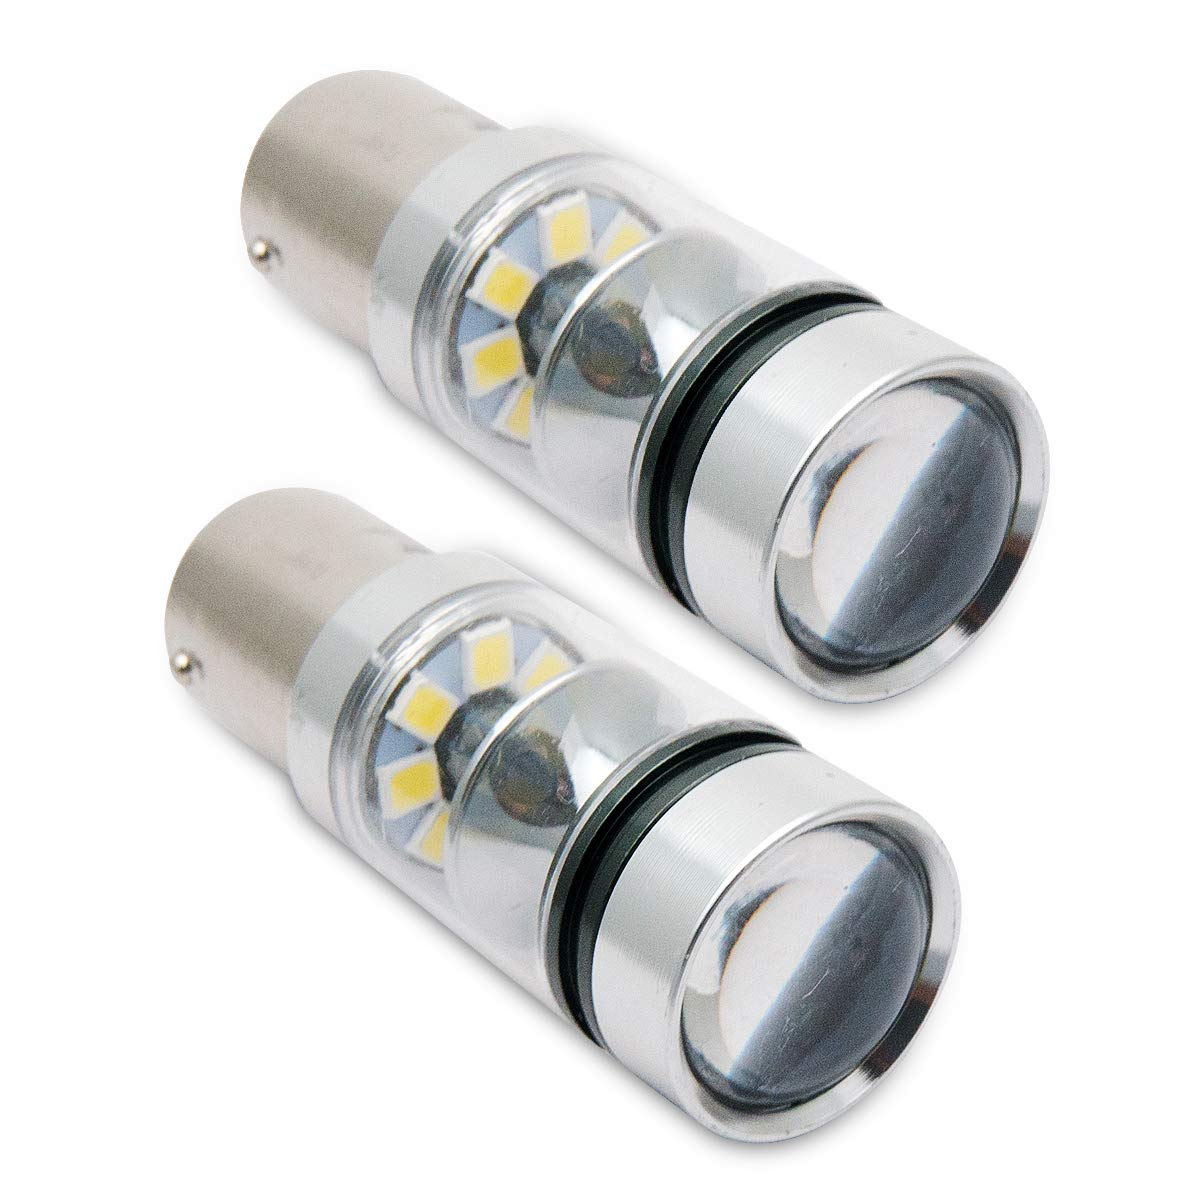 100W 2X 1156 BA15S 382 P21W CREE XBD WHITE LED STOP REVERSE LIGHT CANBUS Bulbs